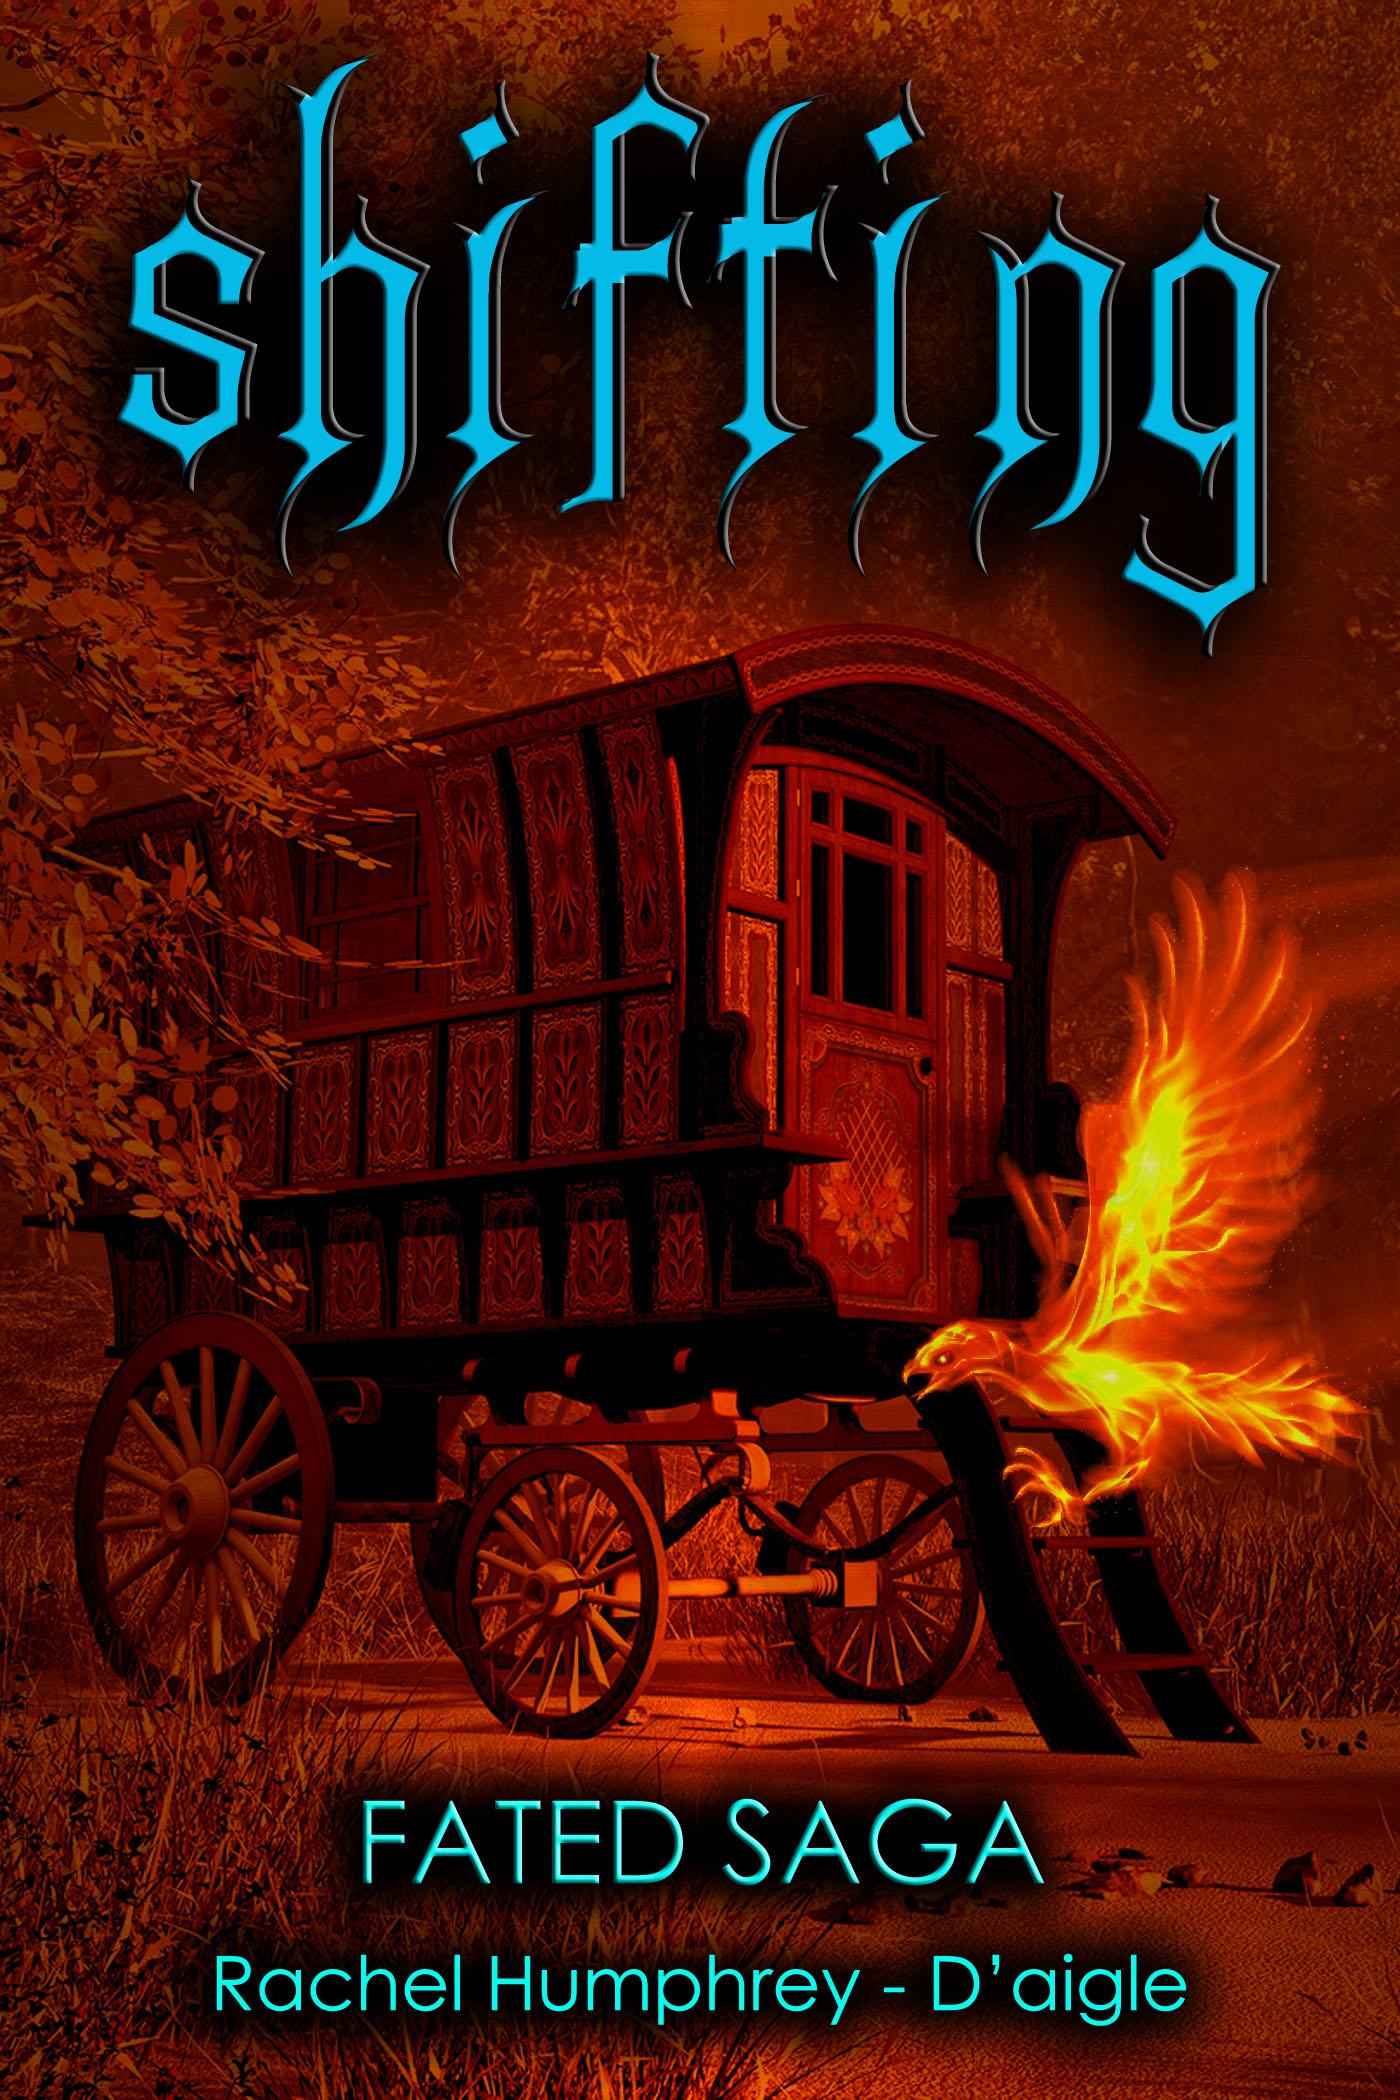 Rachel Humphrey Daigle - Shifting, Book Two in the Fated Saga Fantasy Series